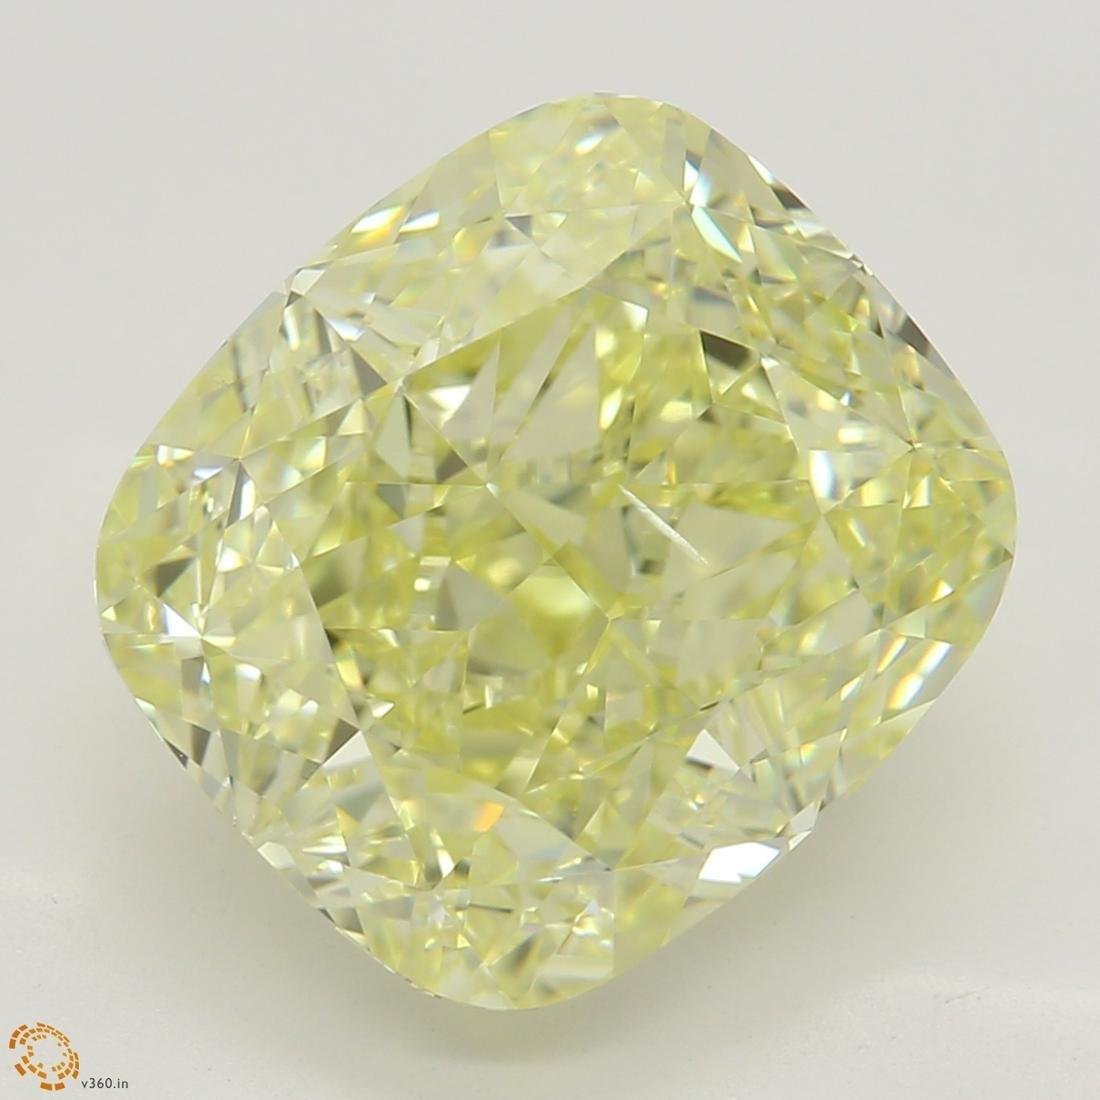 5.03 ct, Lt. Yellow/SI1, Cushion cut Diamond